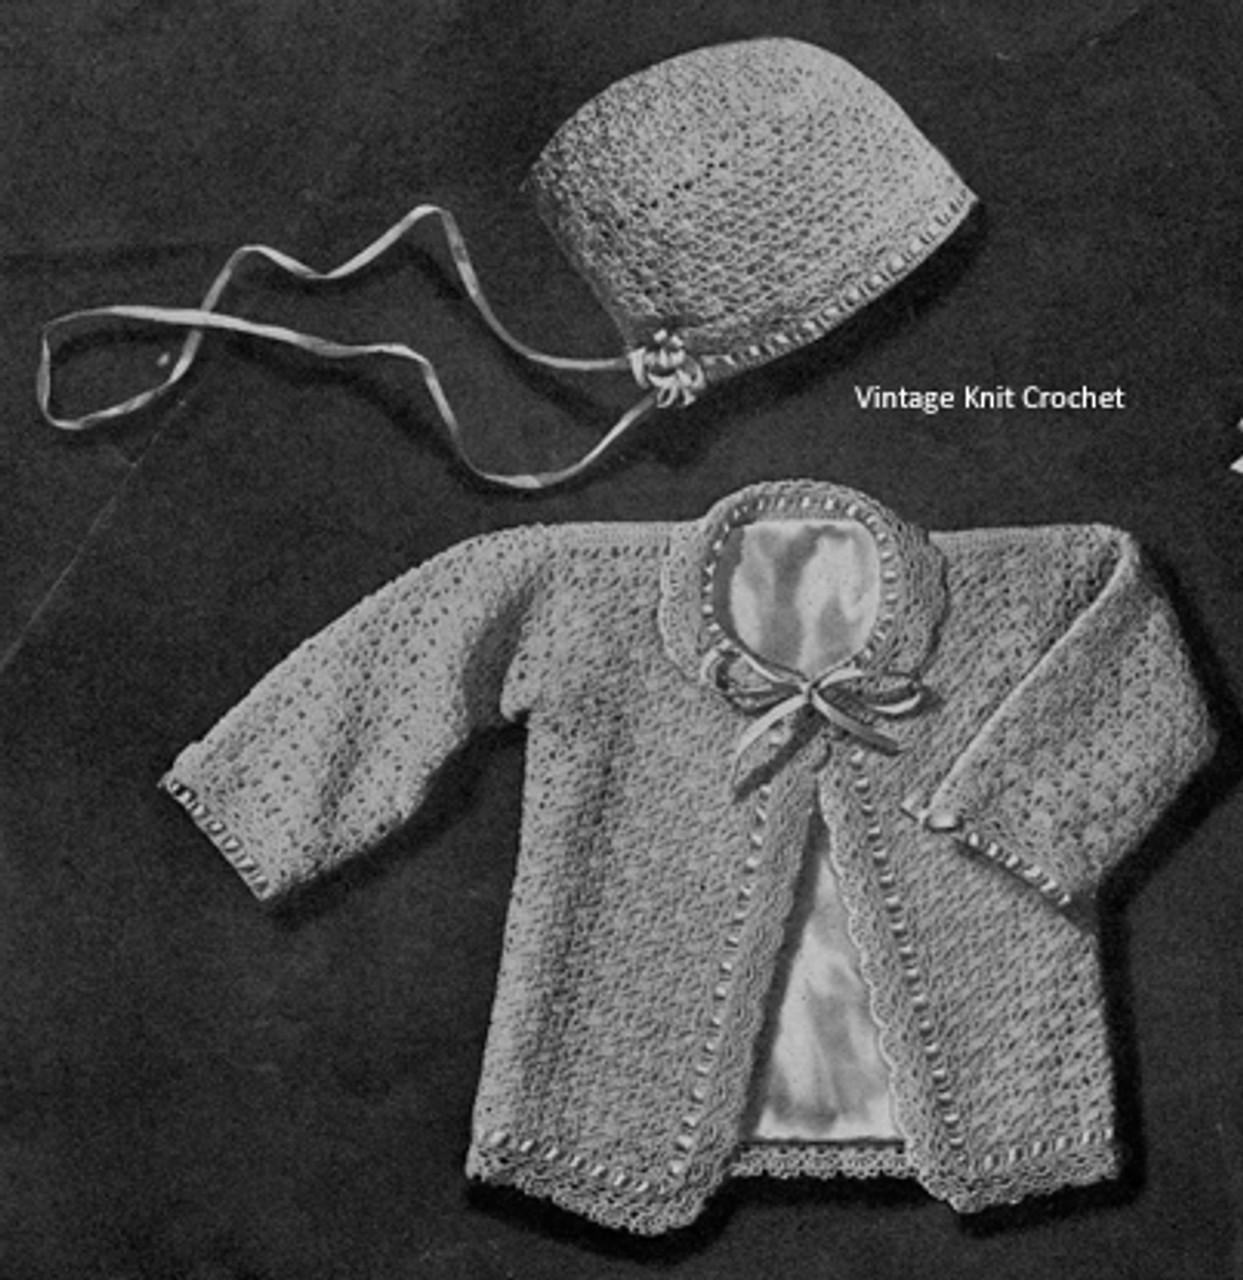 Vintage Baby Sacque and Bonnet Pattern, Vintage 1942